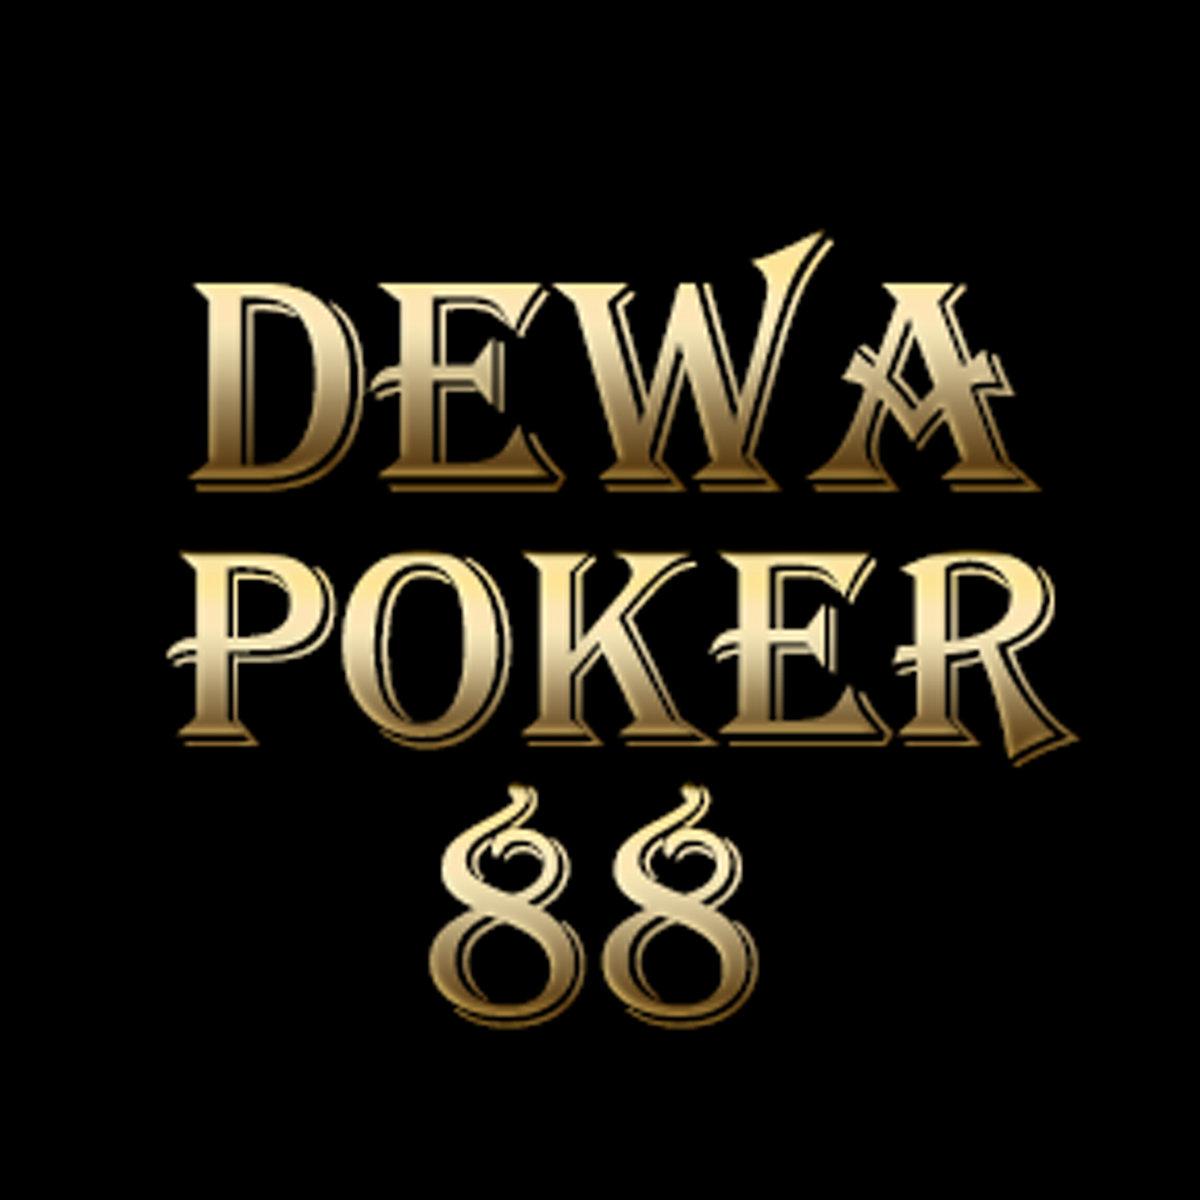 Situs Judi Bola Situs Judi Bola Online Dewapoker Indonesia S No 1 Online Poker Site